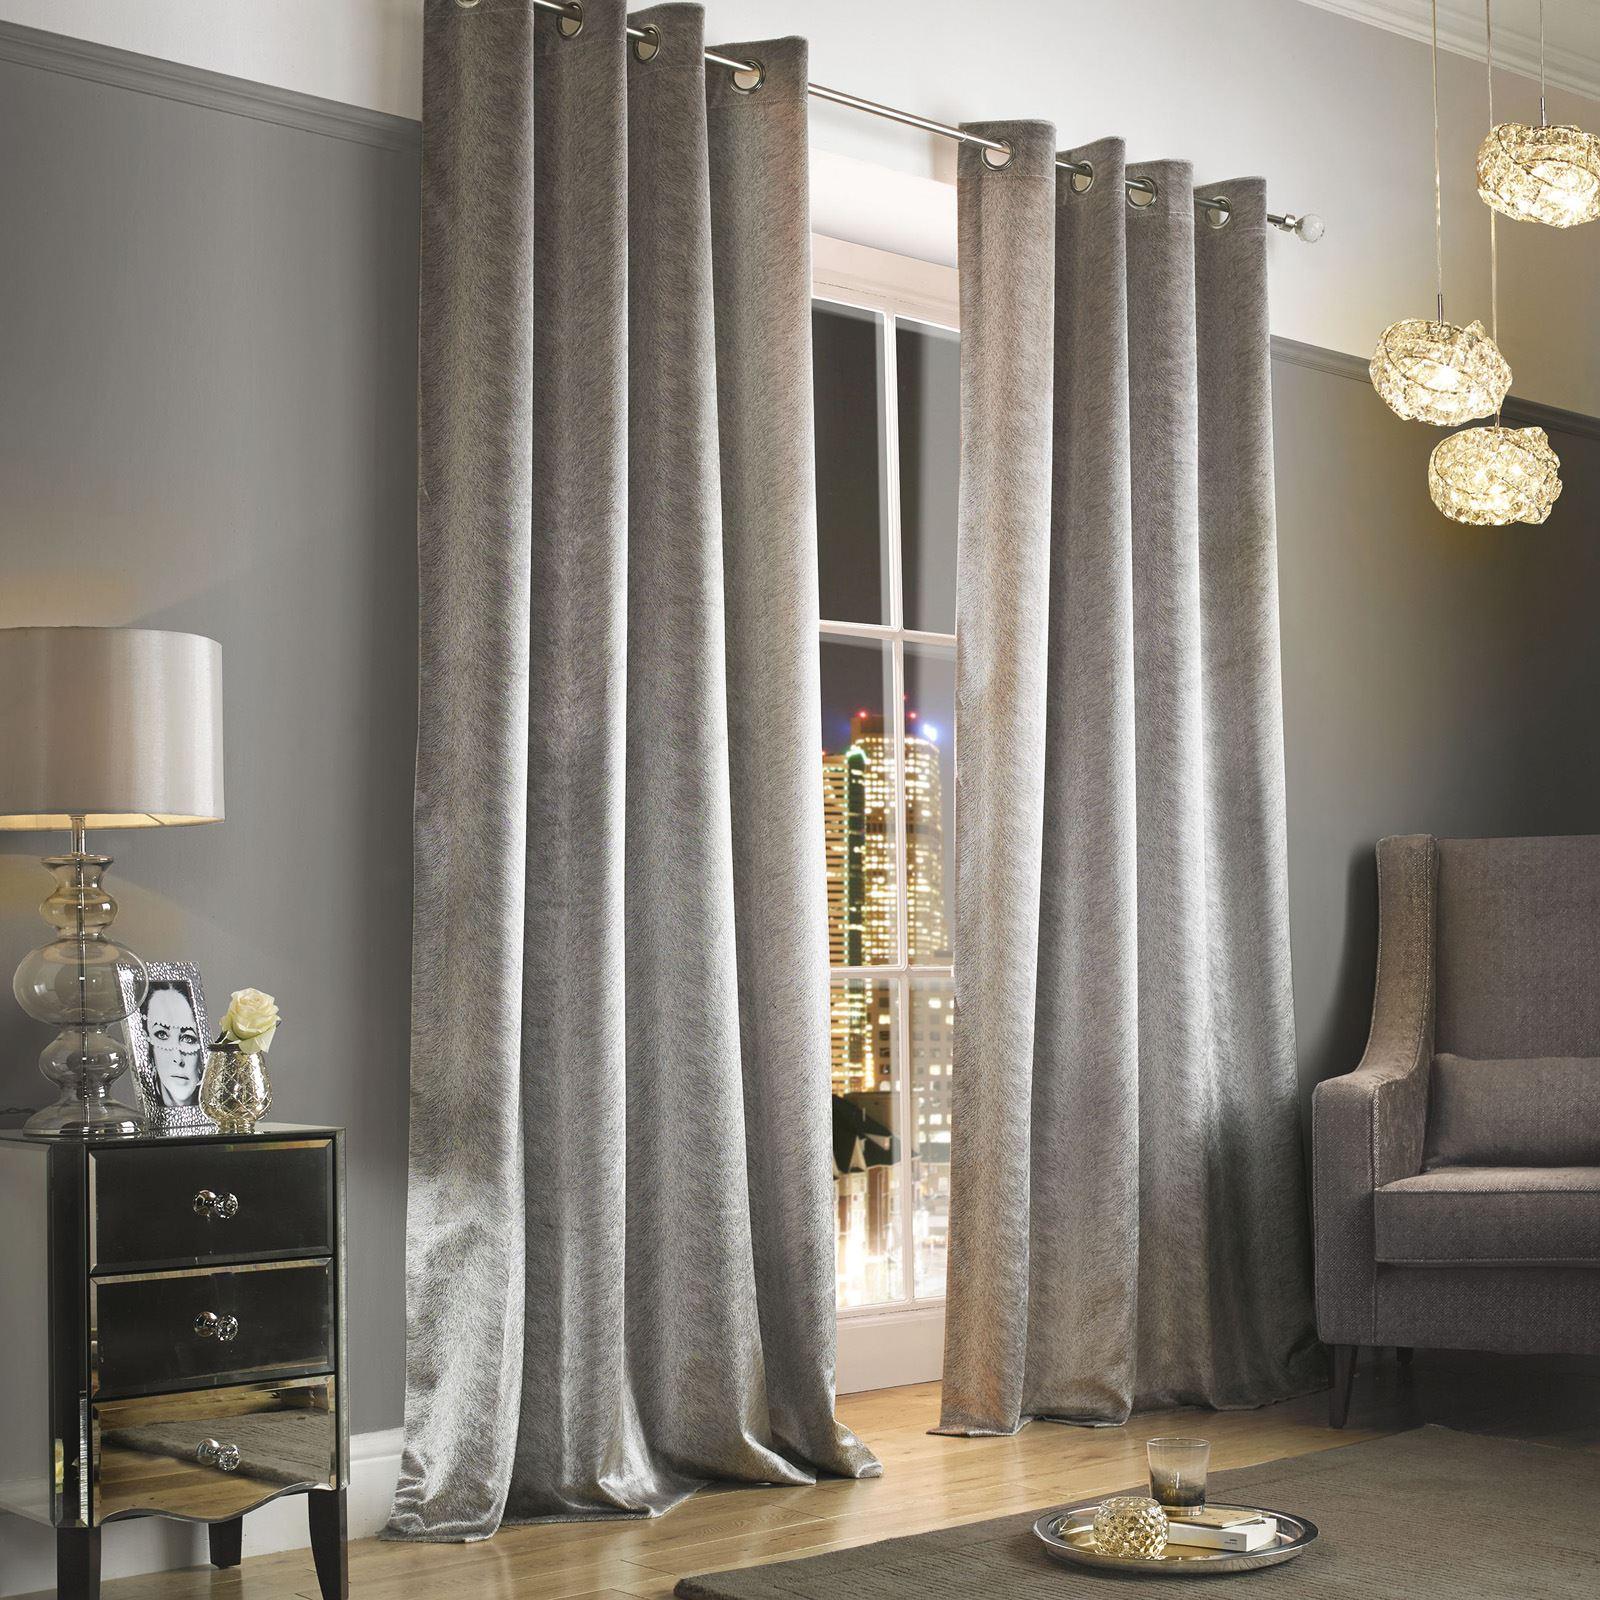 Kylie minogue adelphi curtains mist truffle caramel silver